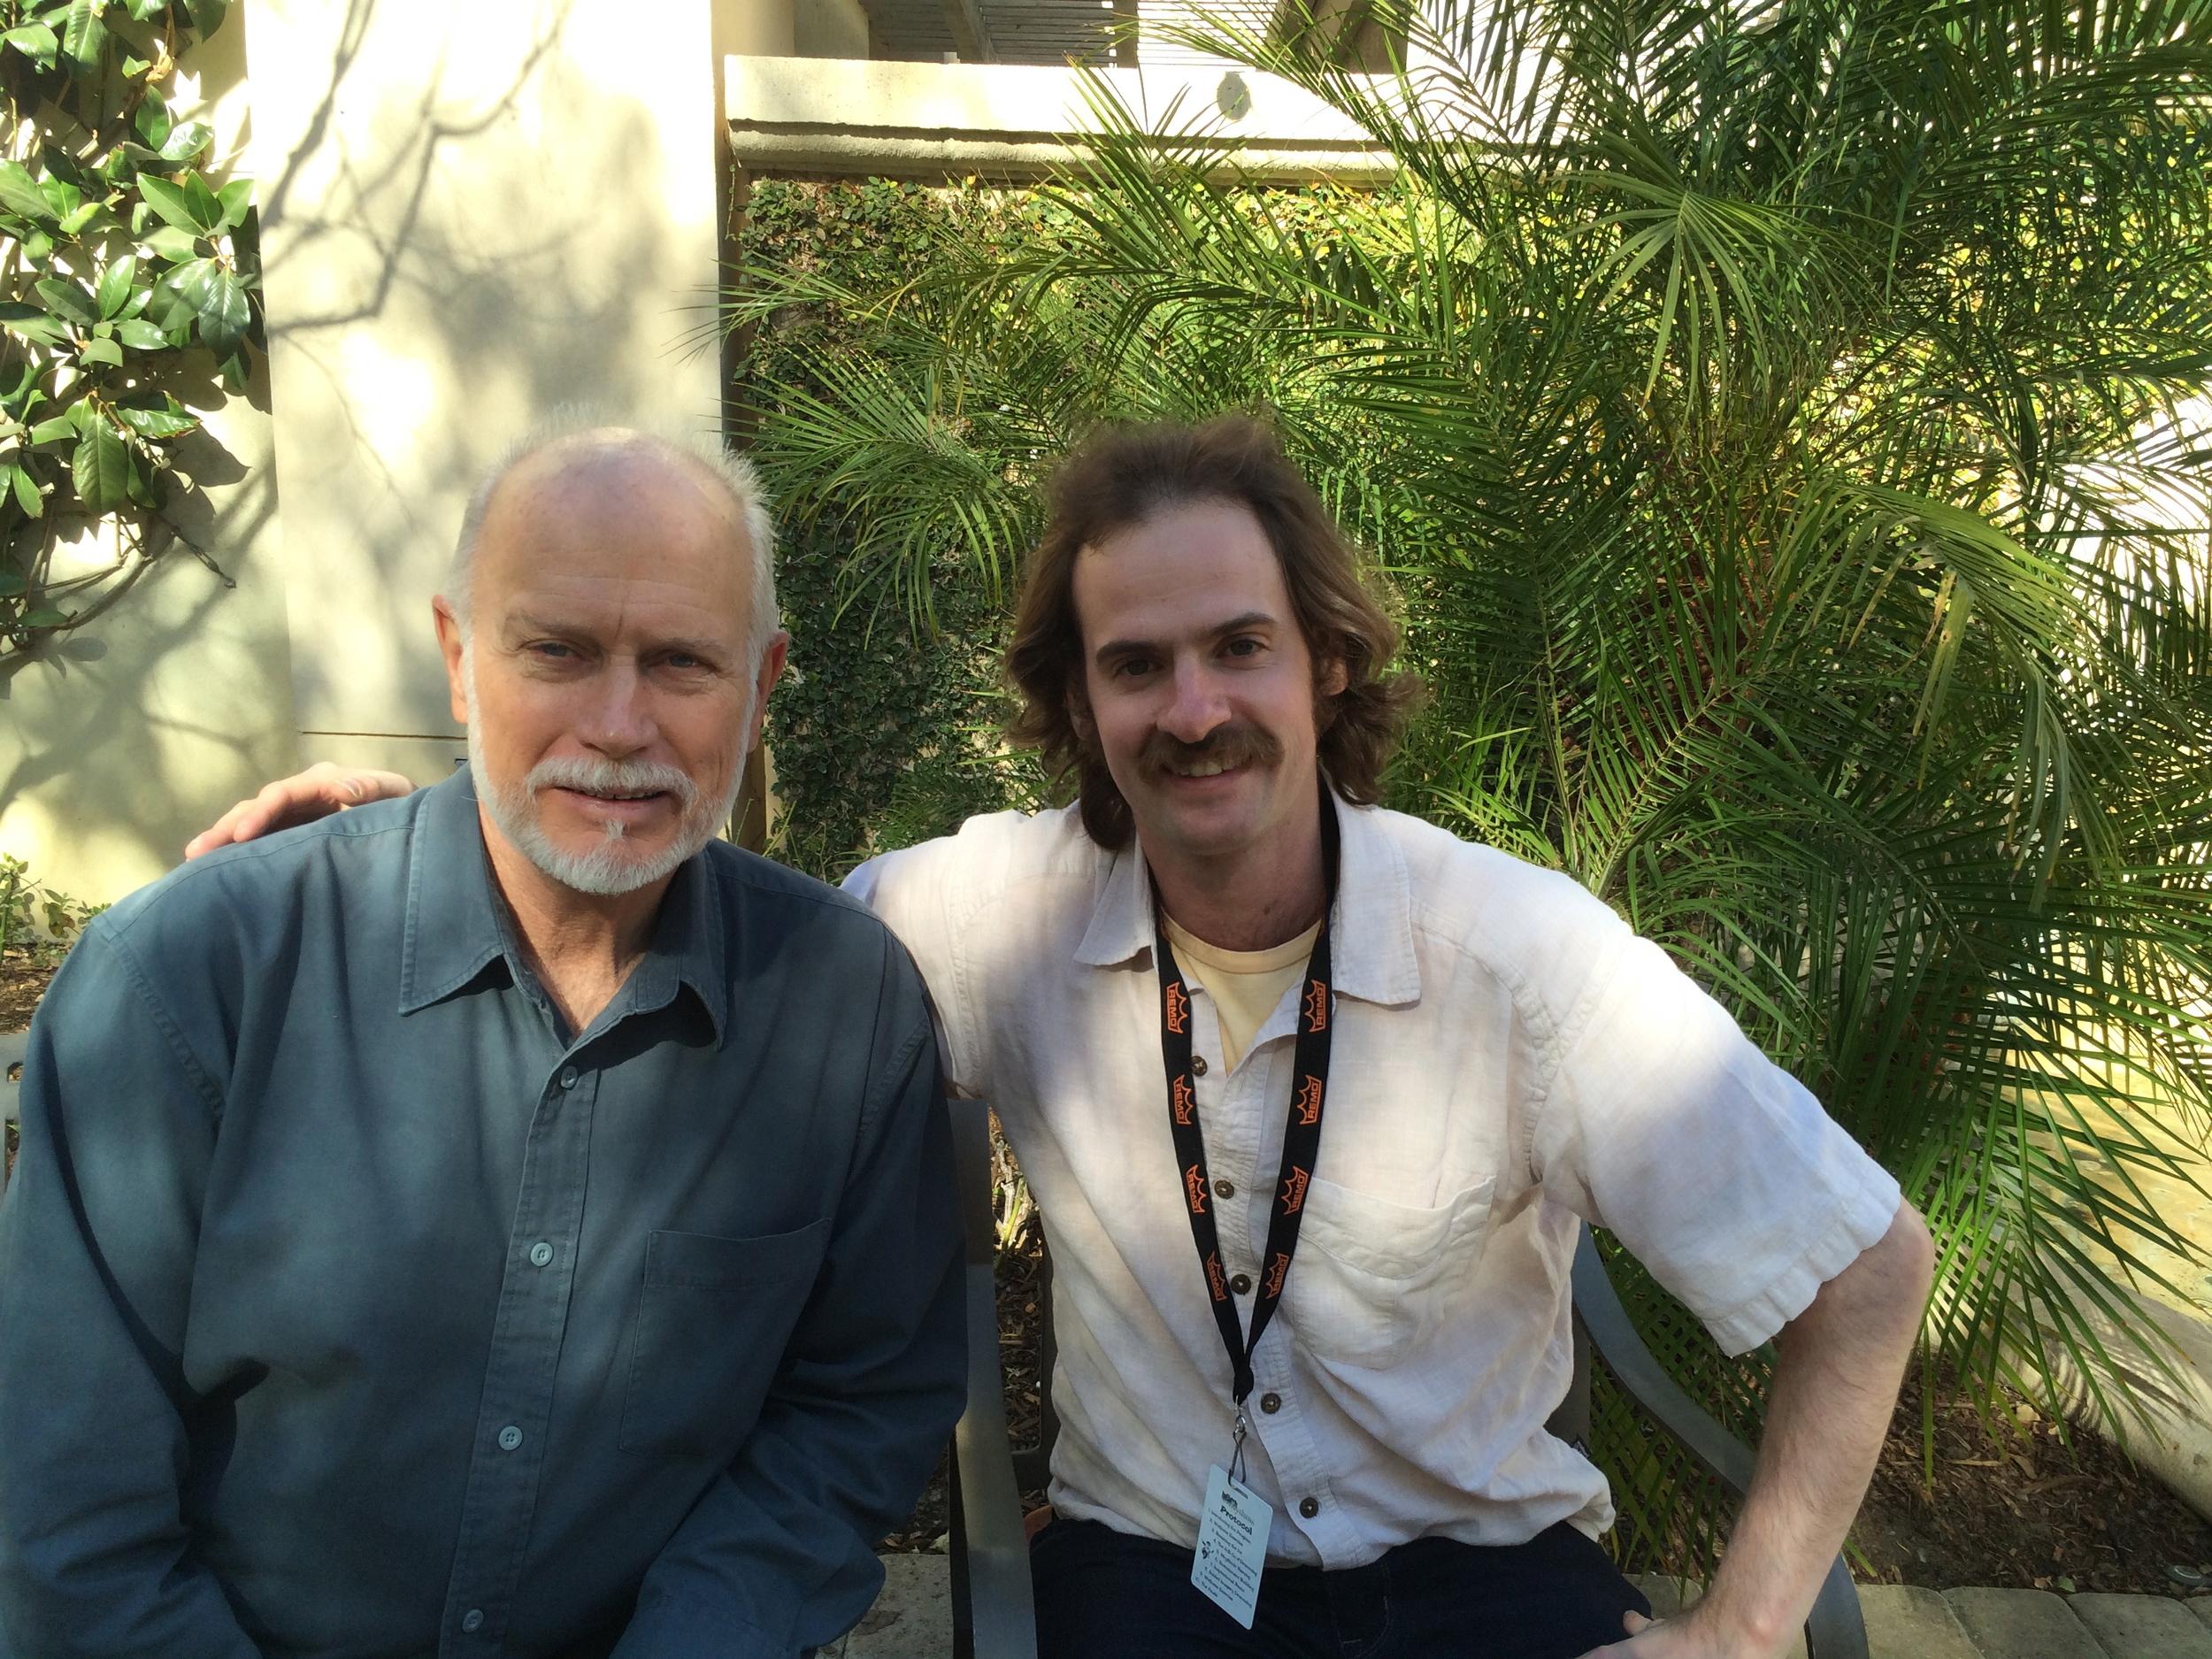 Noah Plotkin & David Van Dorn